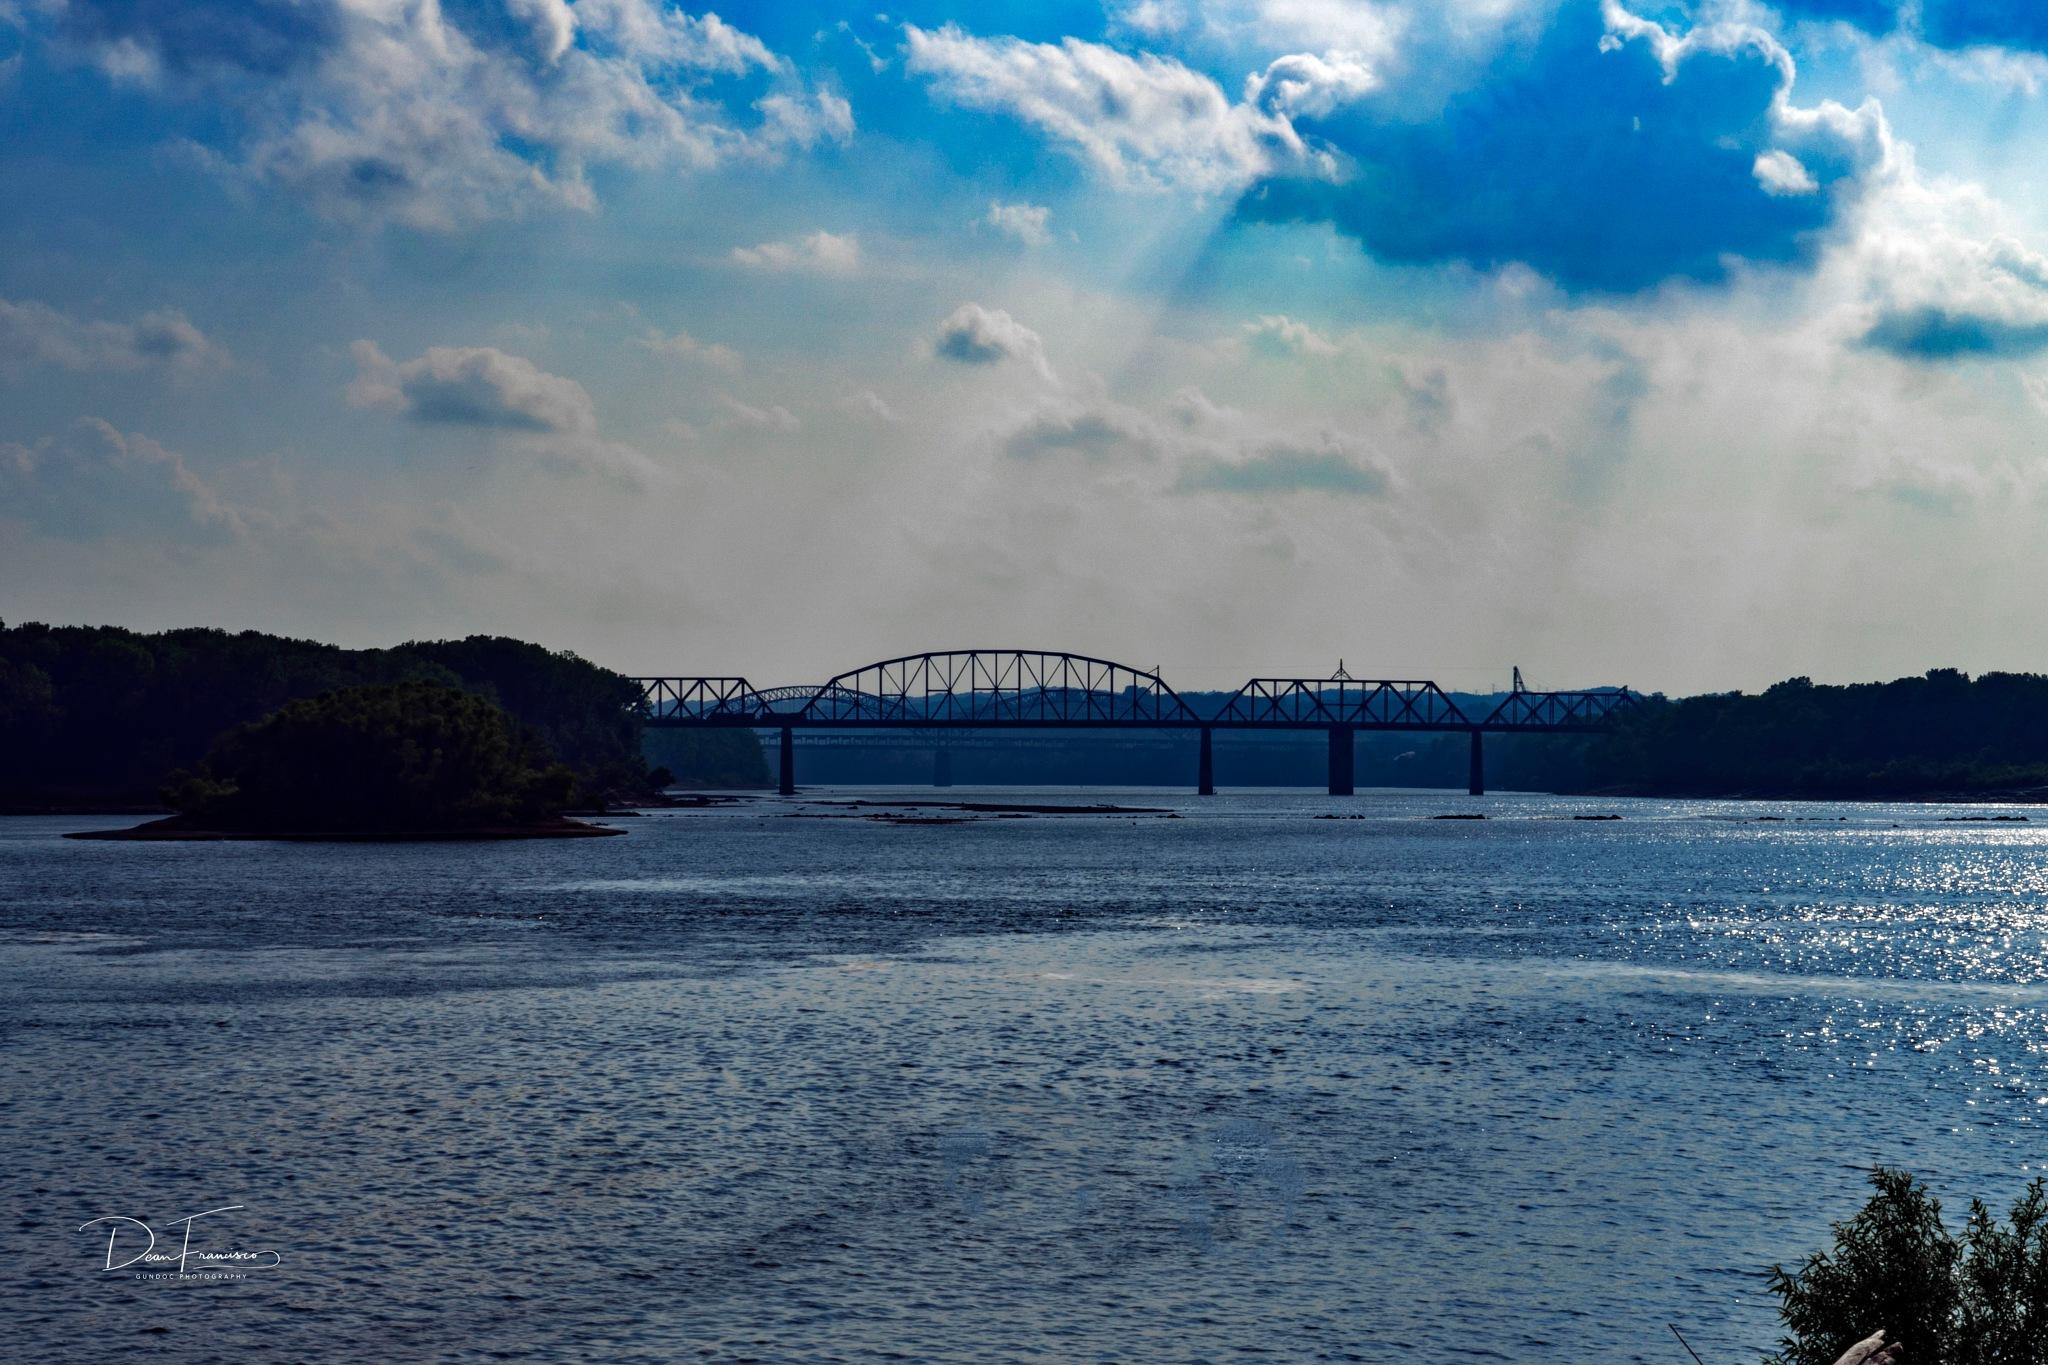 Norfolk Southern RR bridge across the Ohio river by Dean Francisco